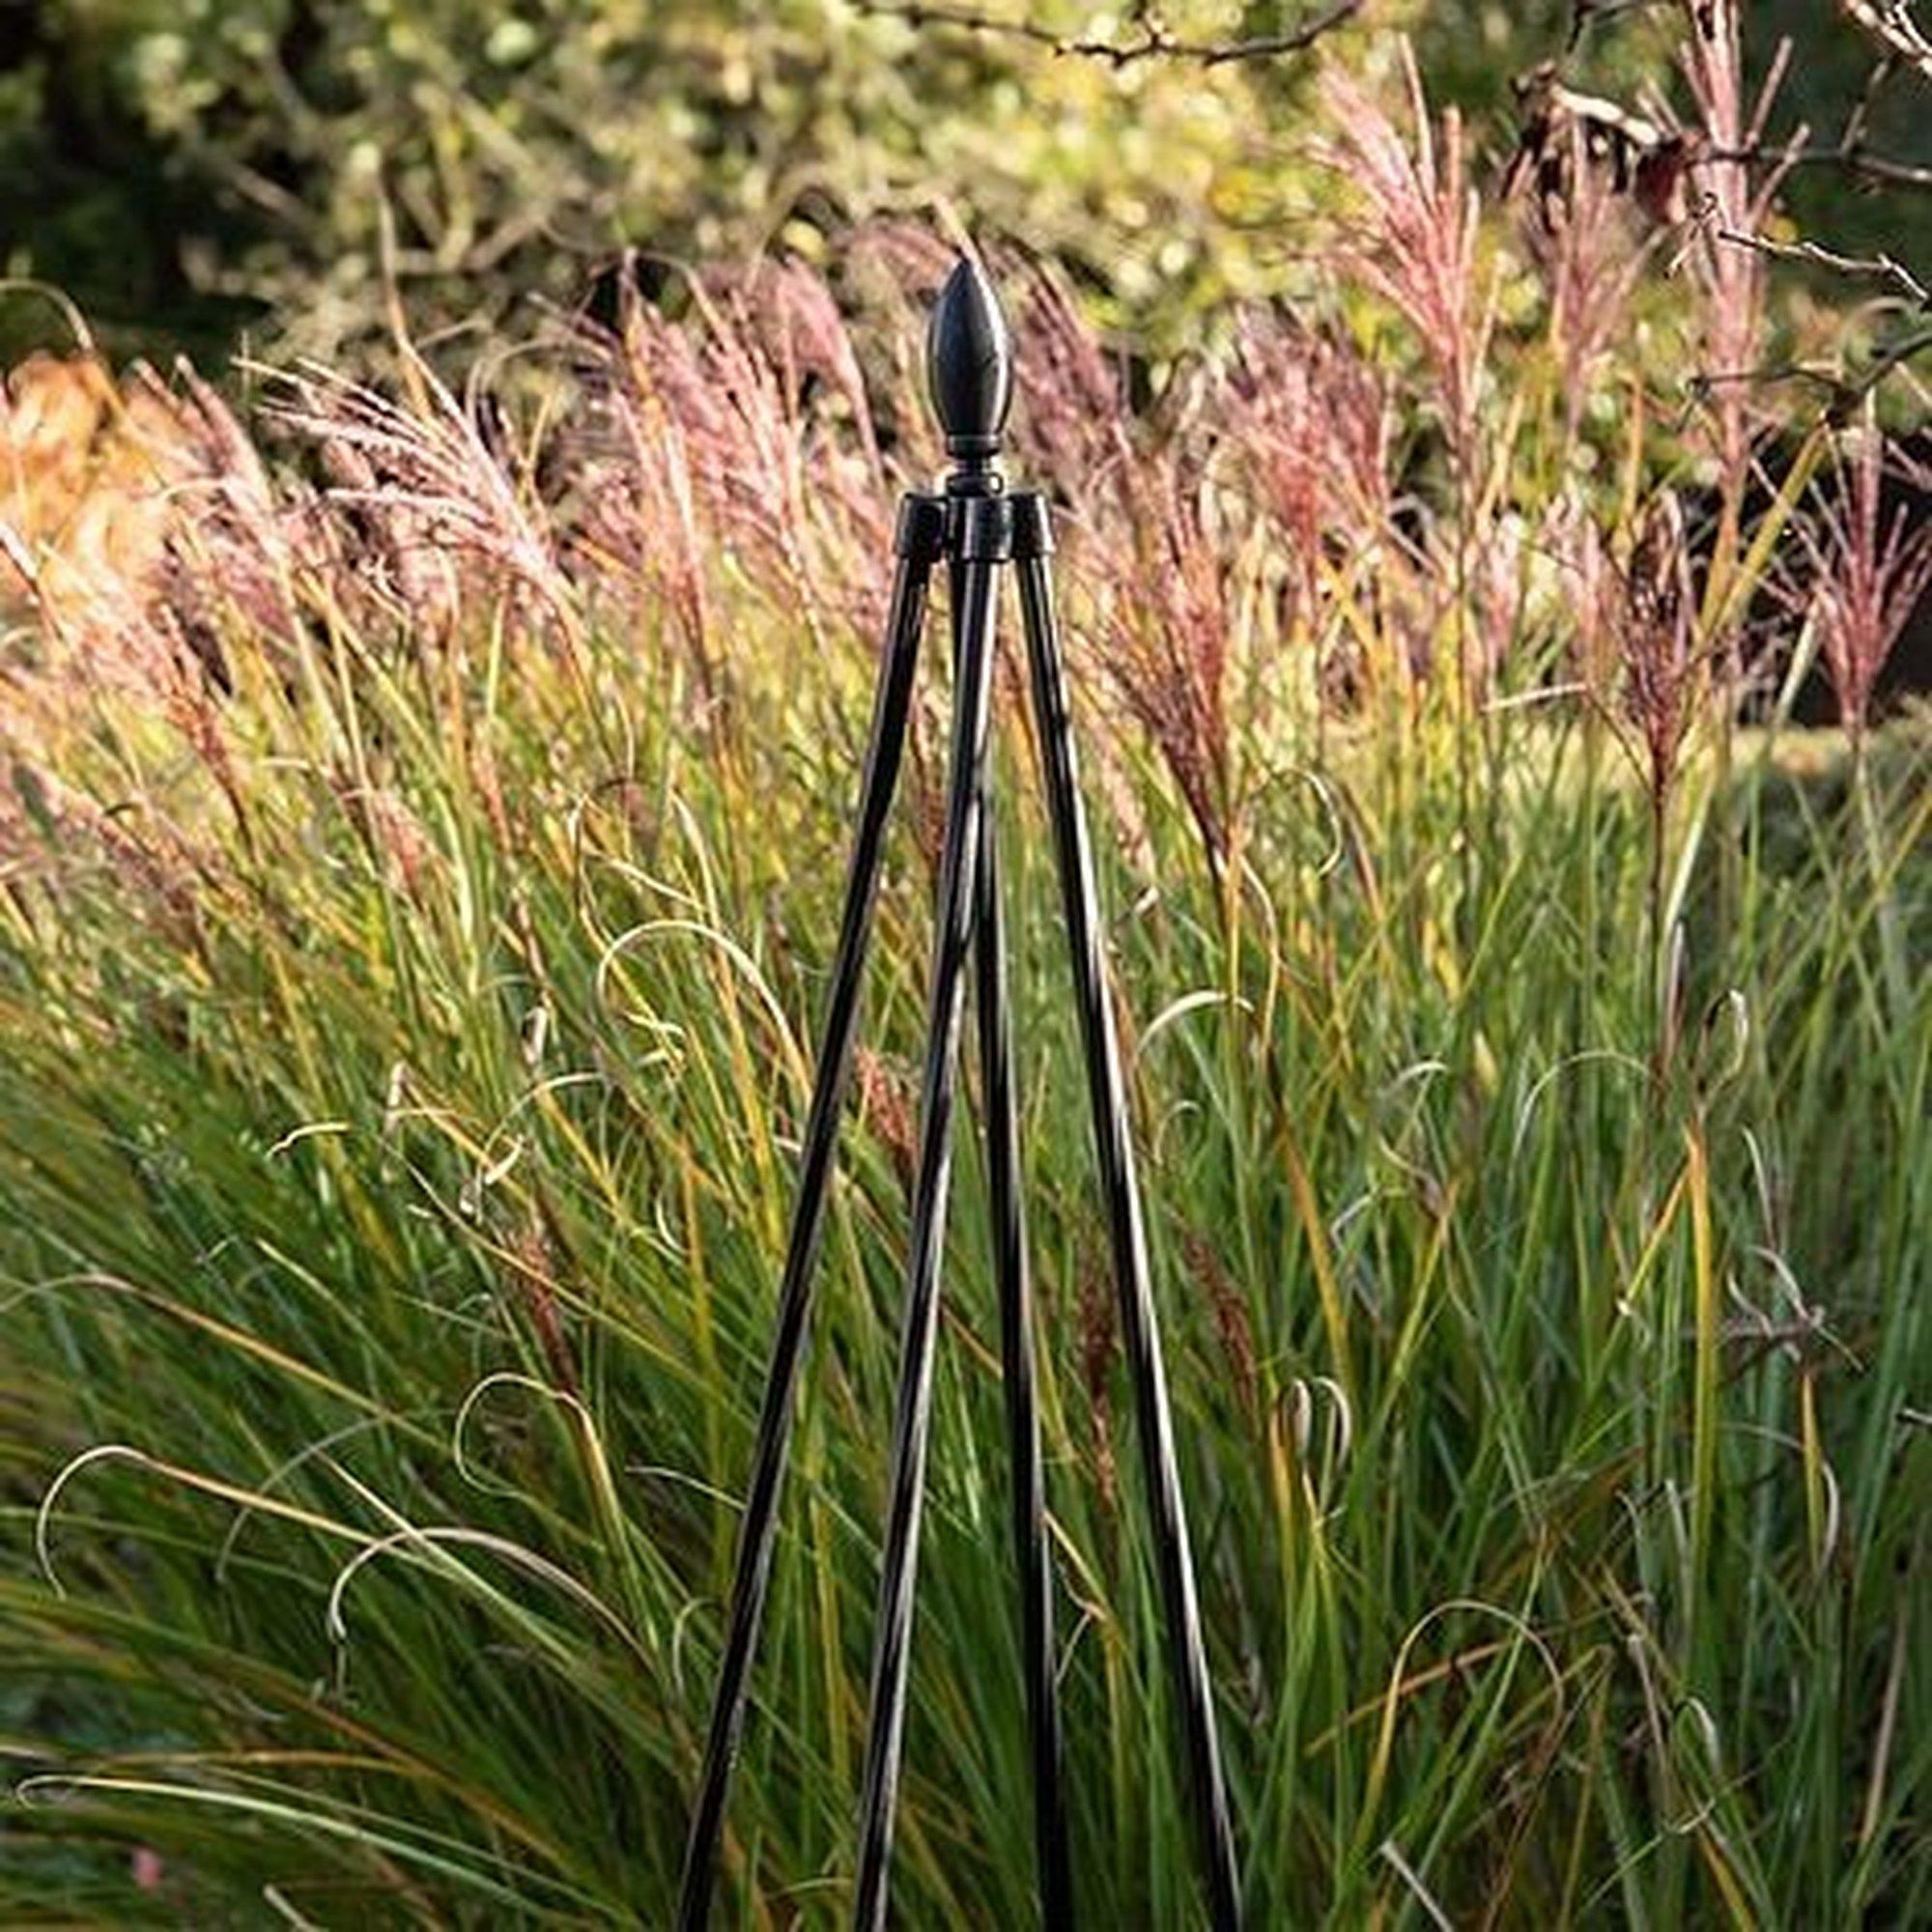 Image of 1.8m Garden Tepee Trellis